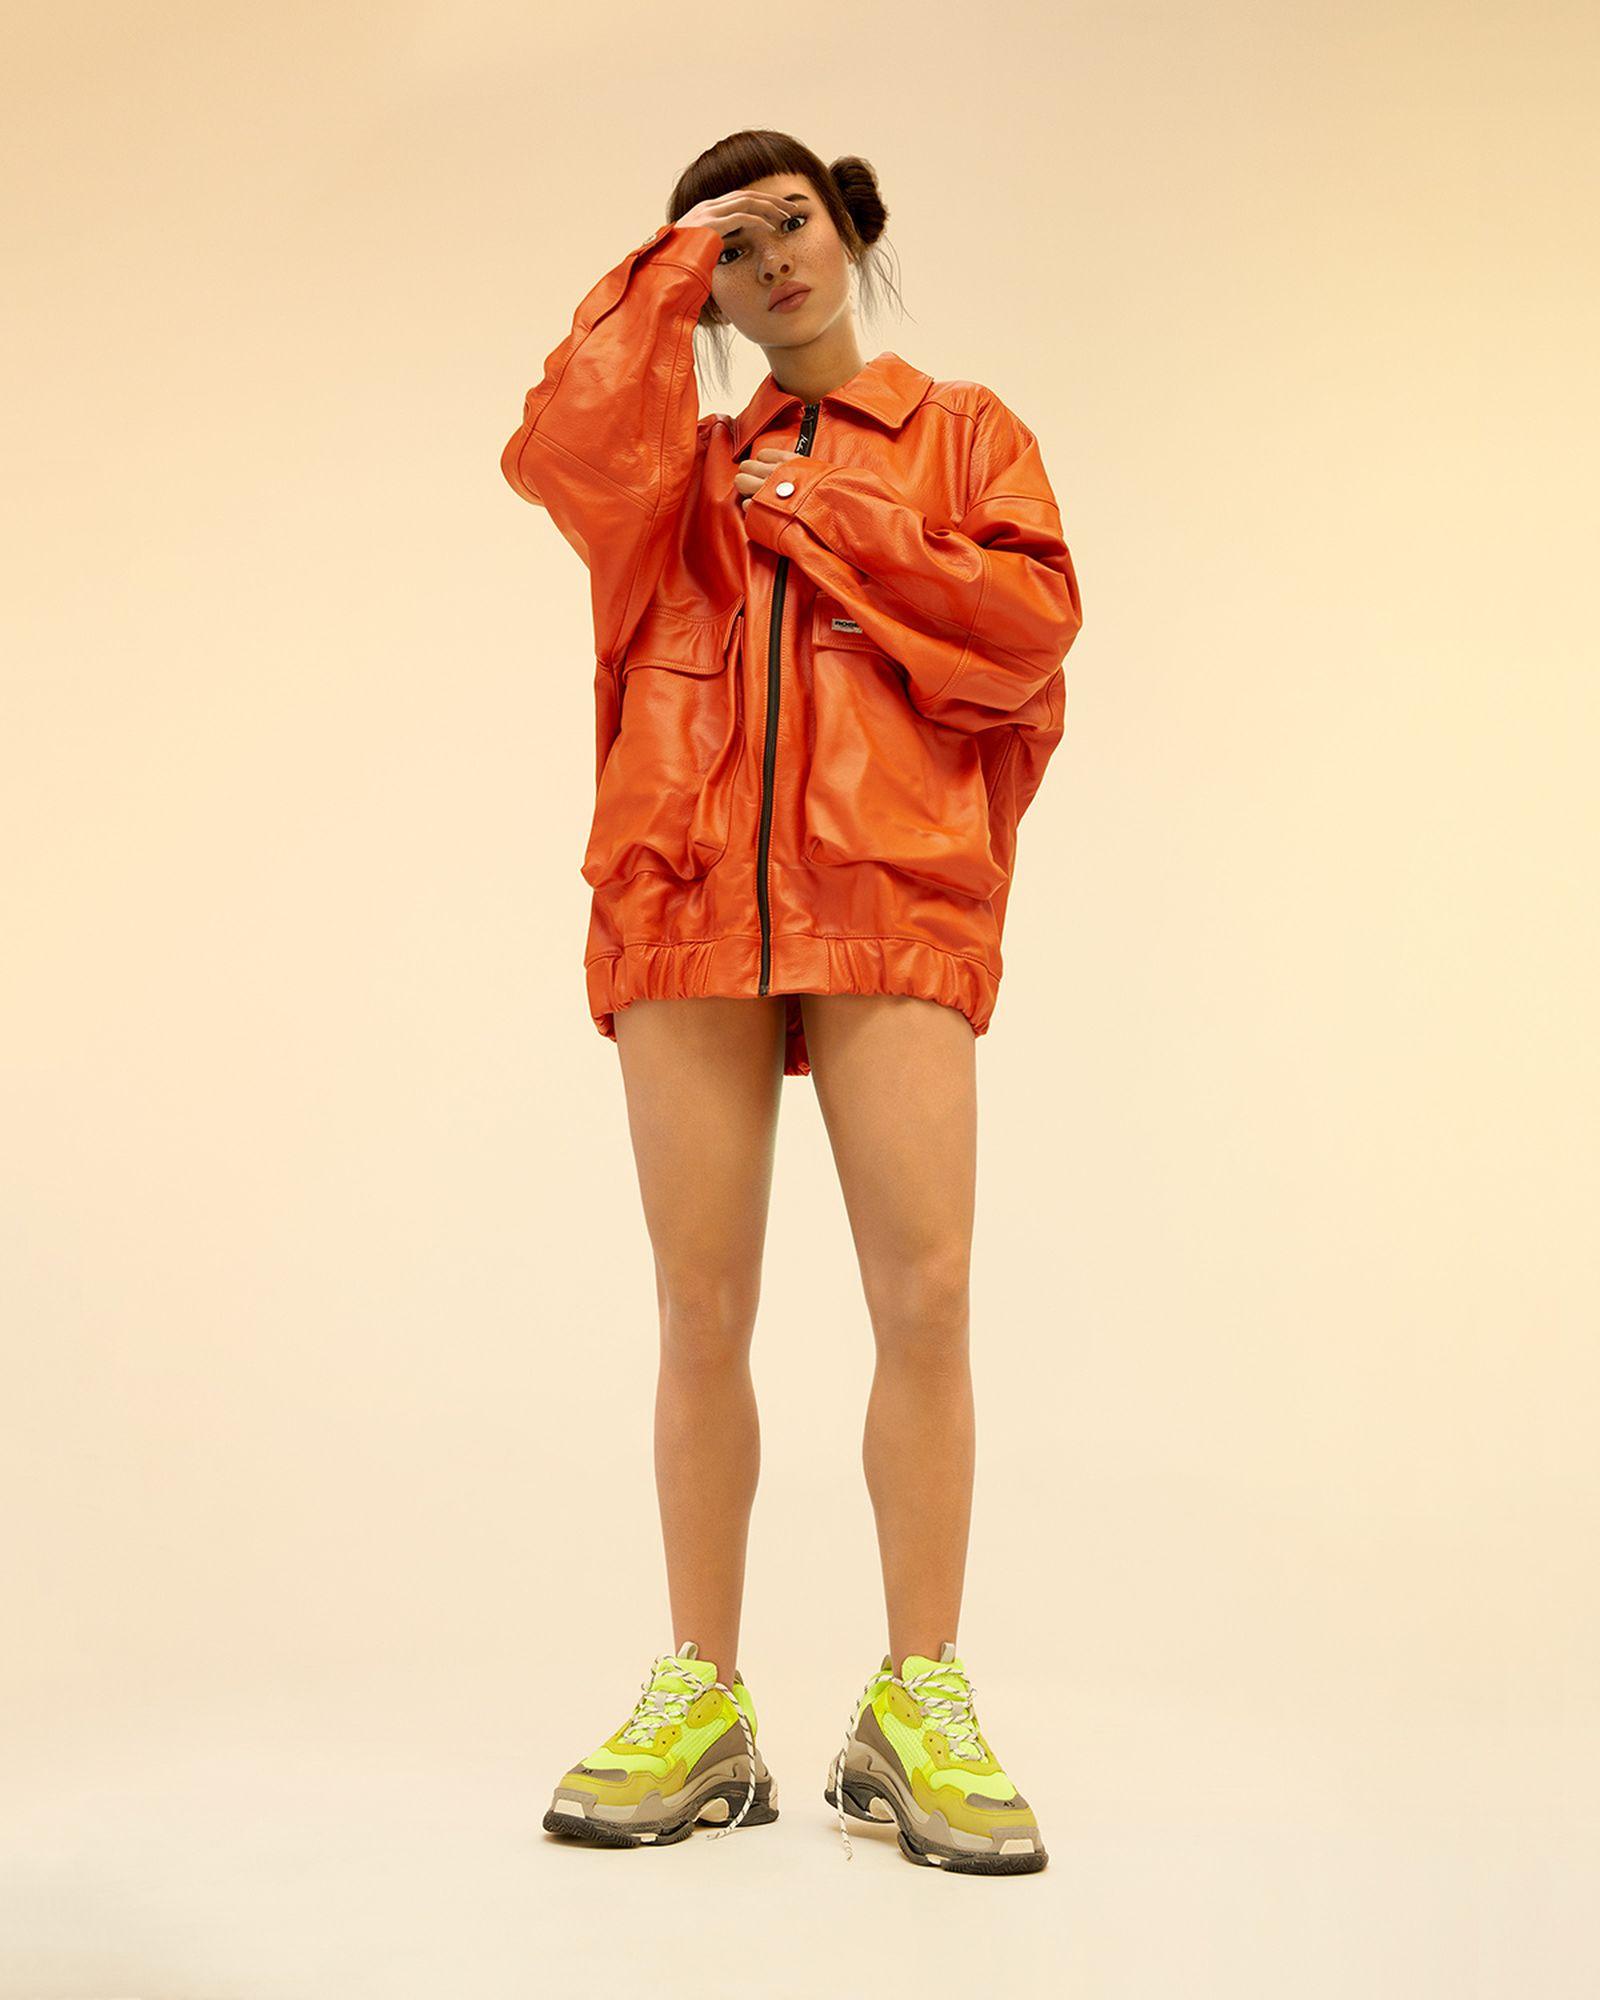 Jacket - MARTINE ROSE, Sneakers - BALENCIAGA.